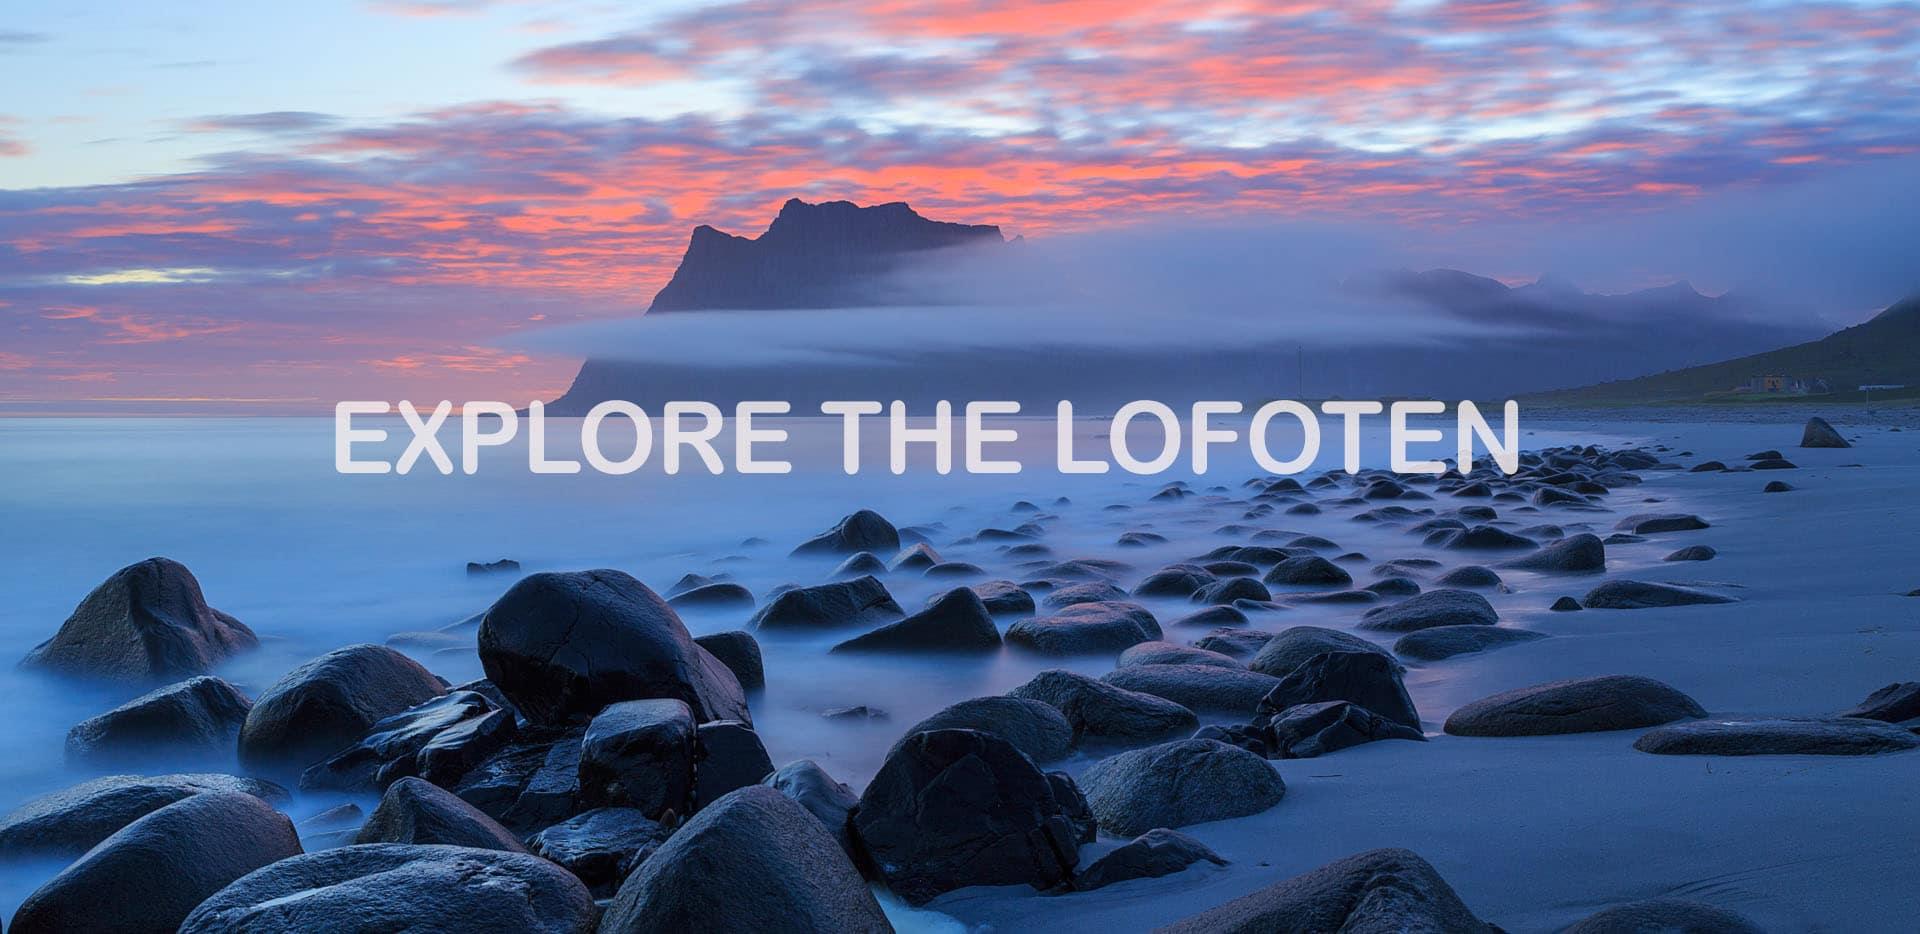 Explore the Lofoten, thavel resouce about Lofoten Islands